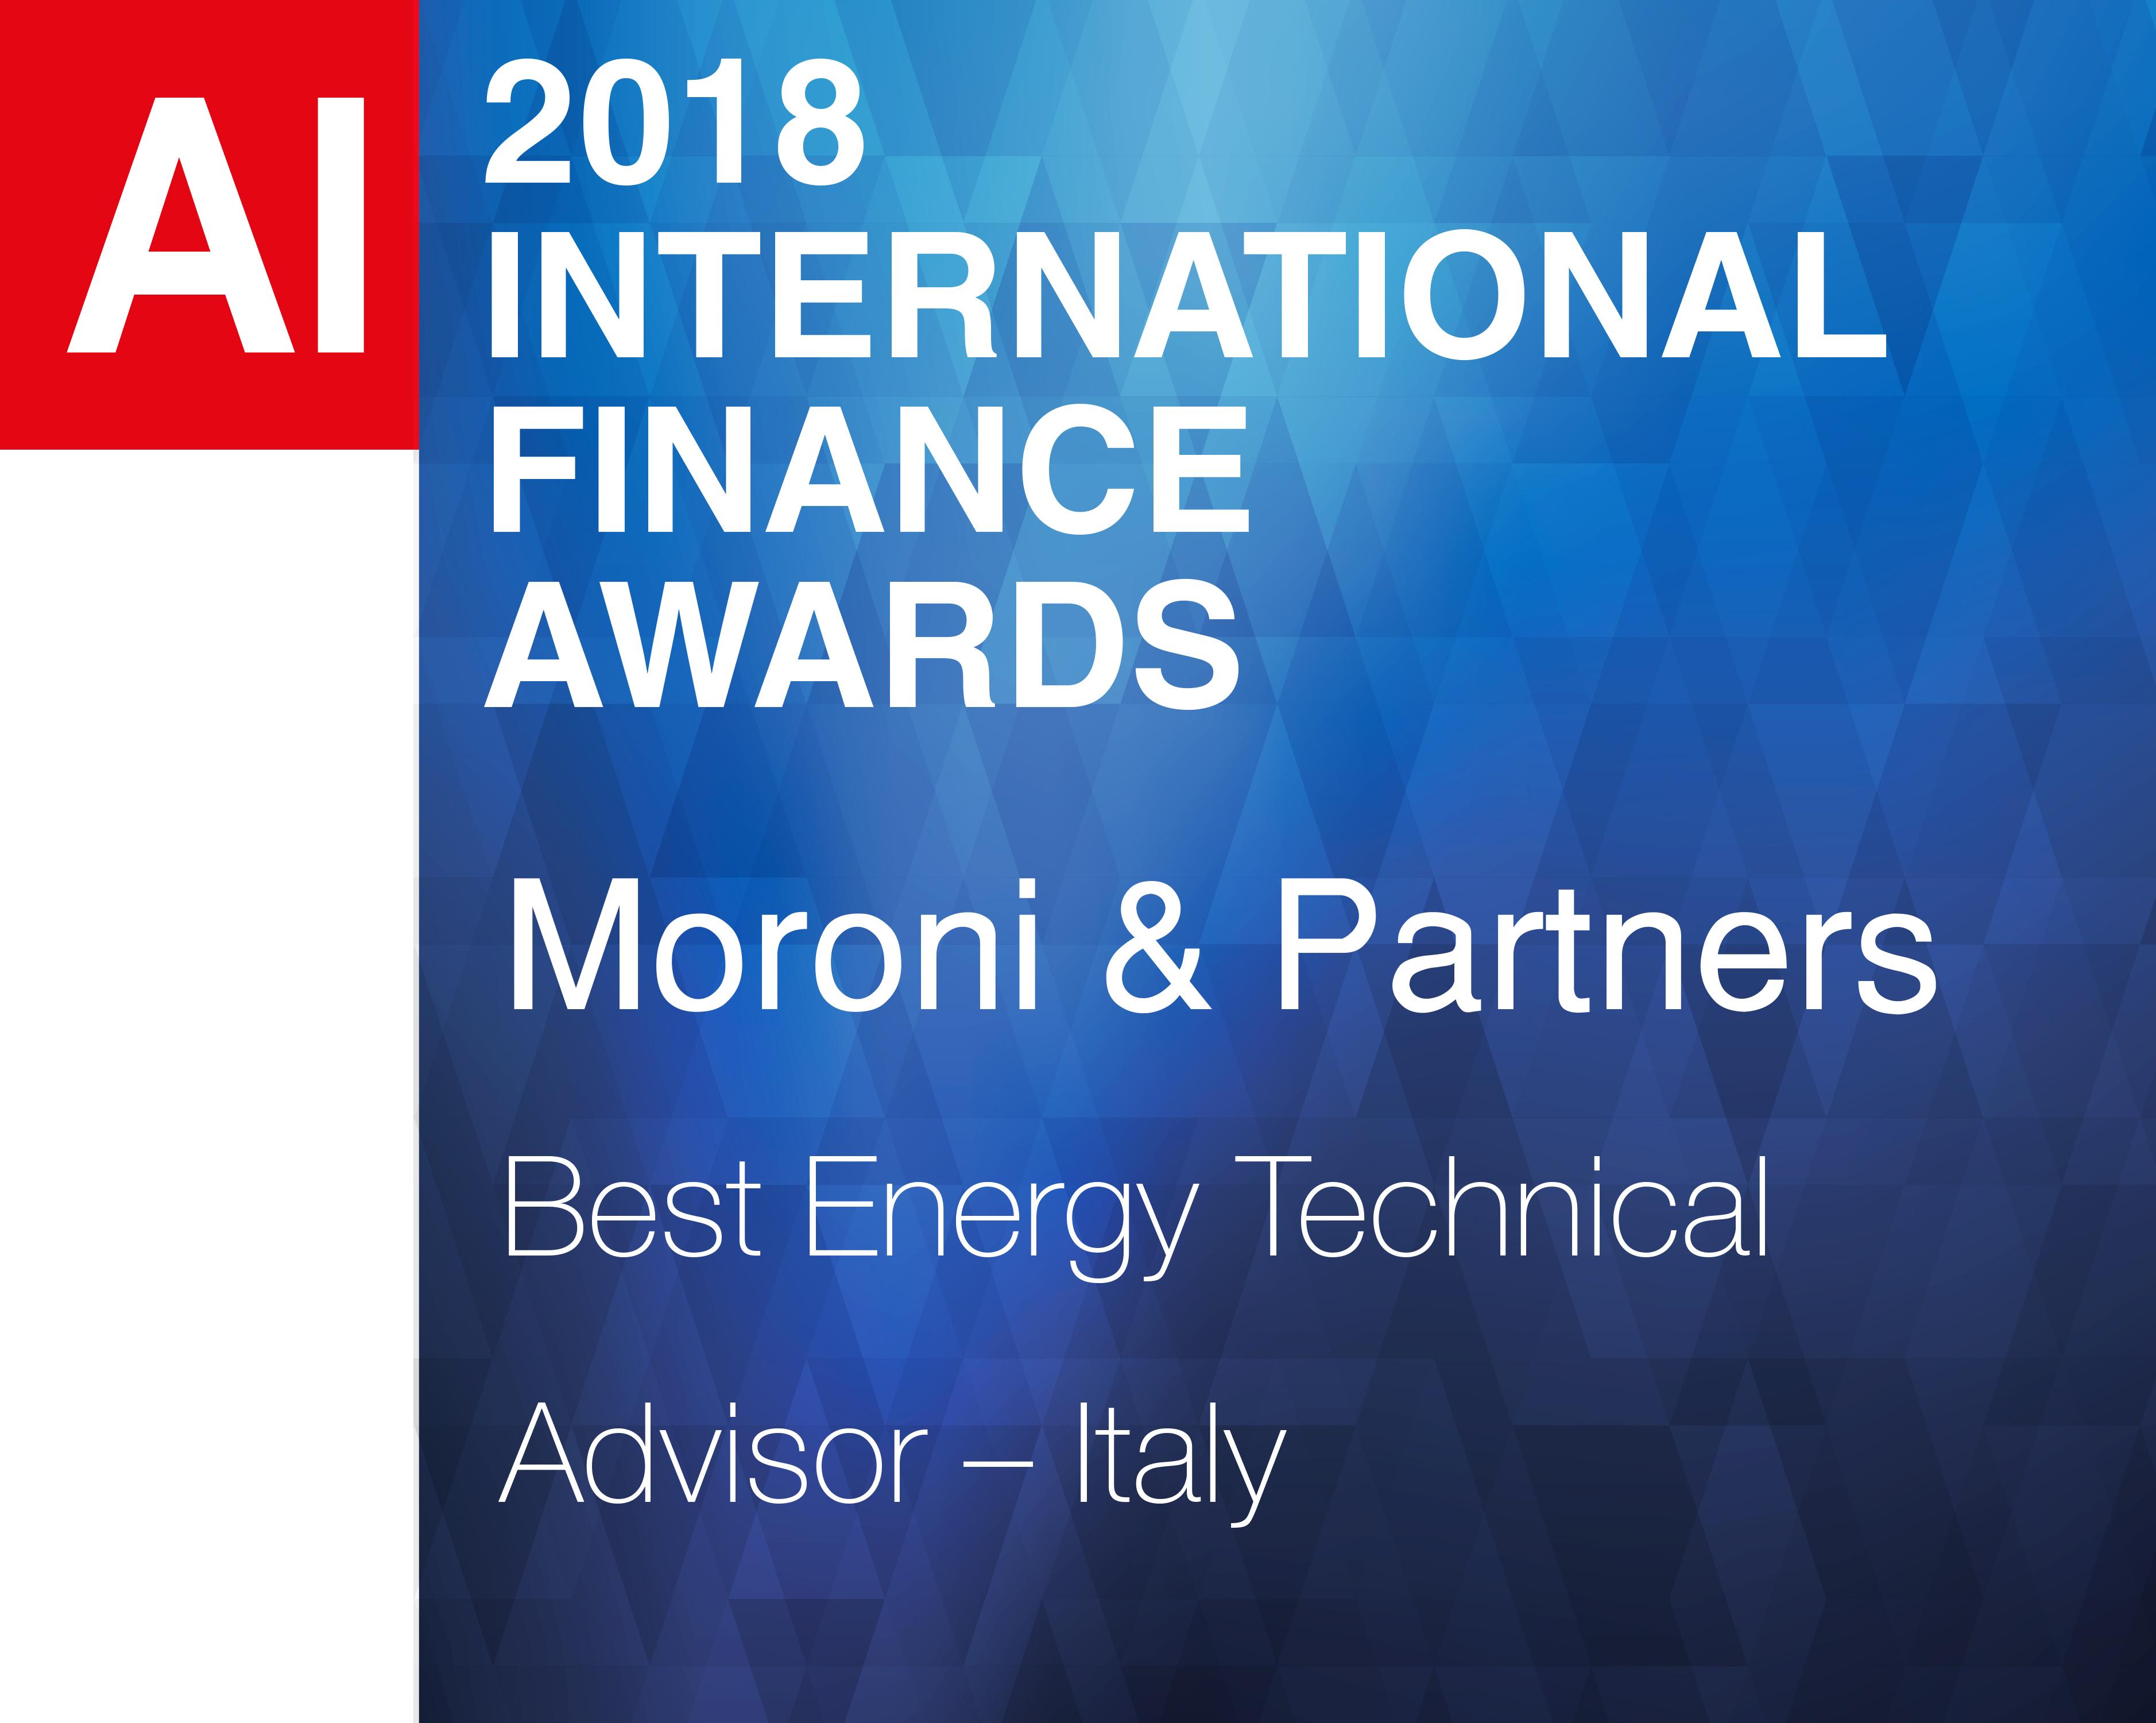 Moroni & Partners wins the international financial award 2018